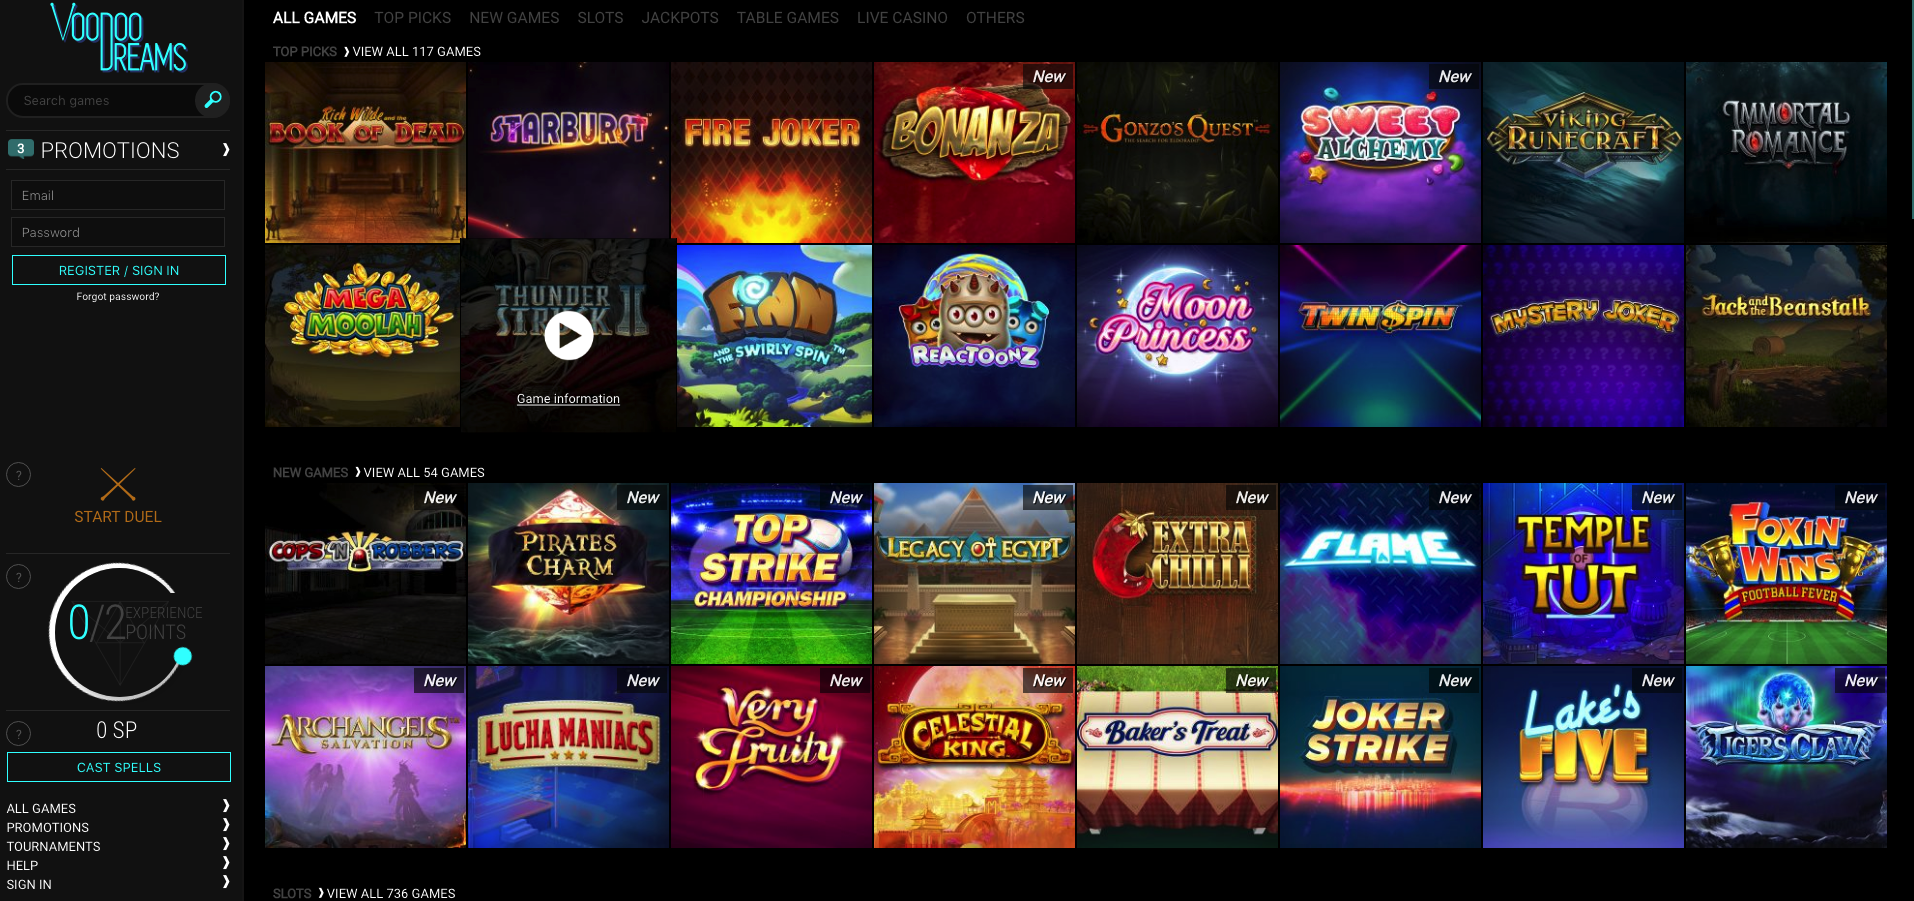 mgm grand online casino bonus codes